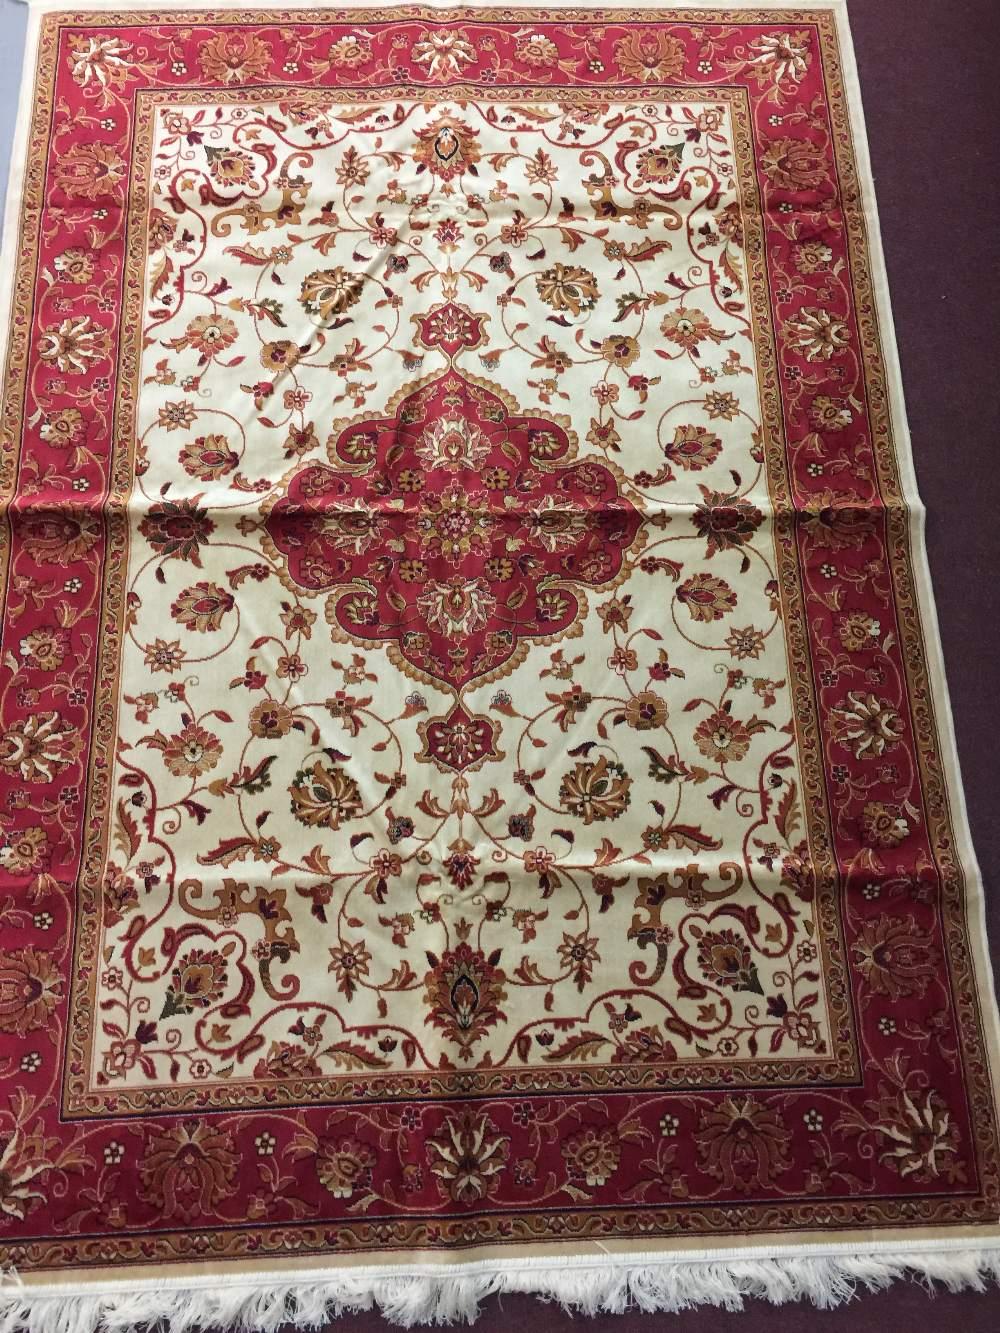 Lot 34 - @21st cent. Carpets: Keshan carpet, beige ground. 2.30 x 1.60.